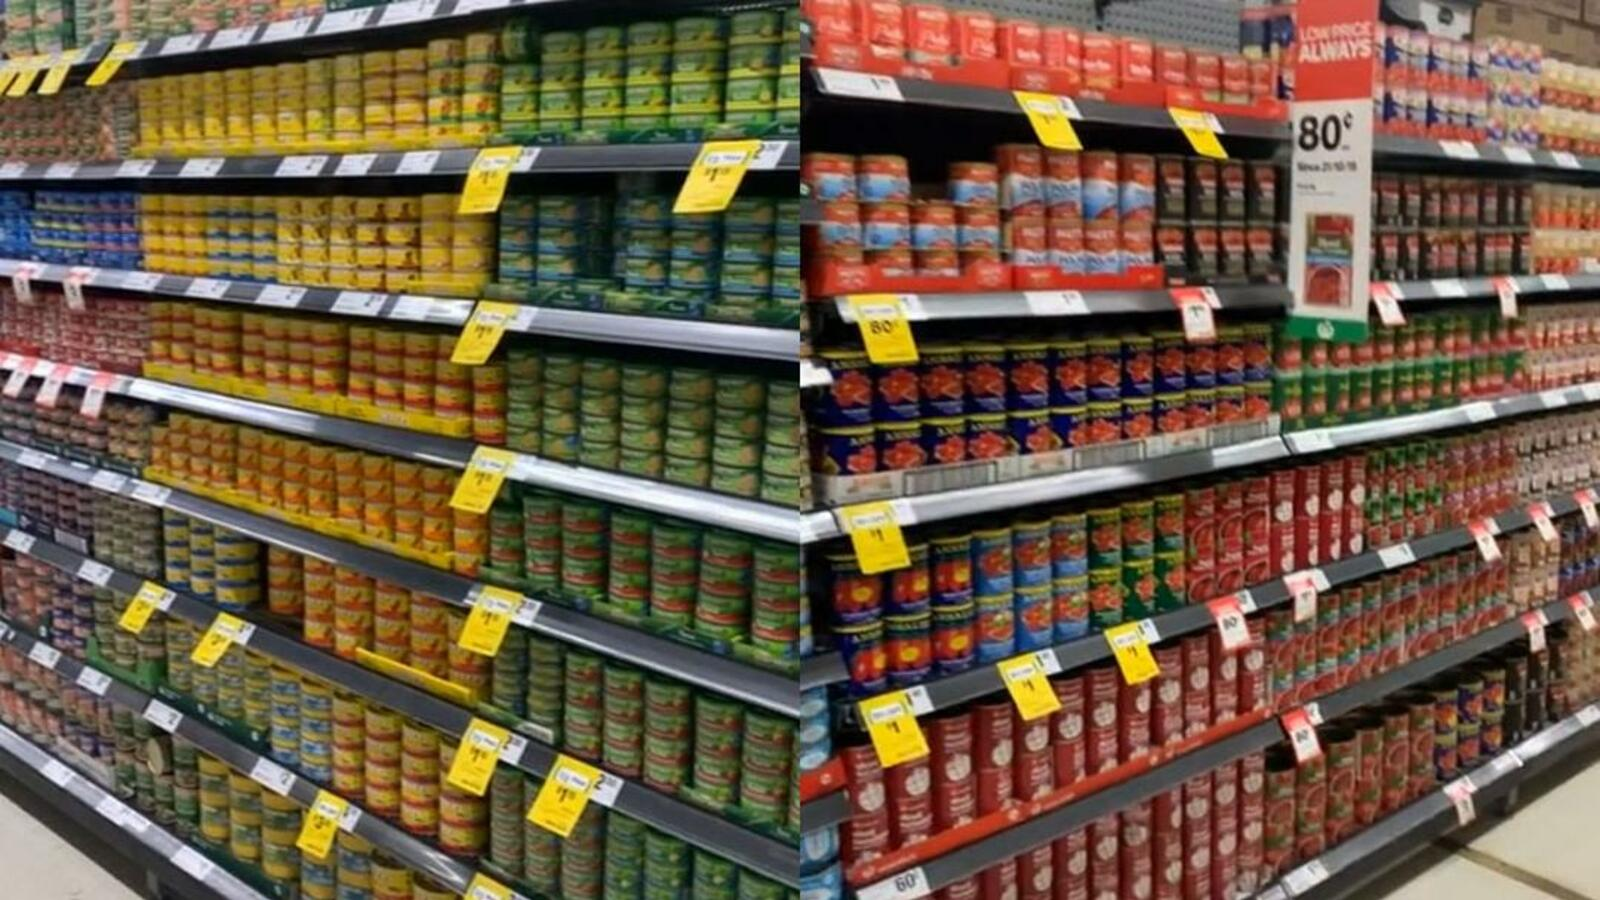 Woolies Shopper Goes Viral After Sharing Shocking Shelf Detailing